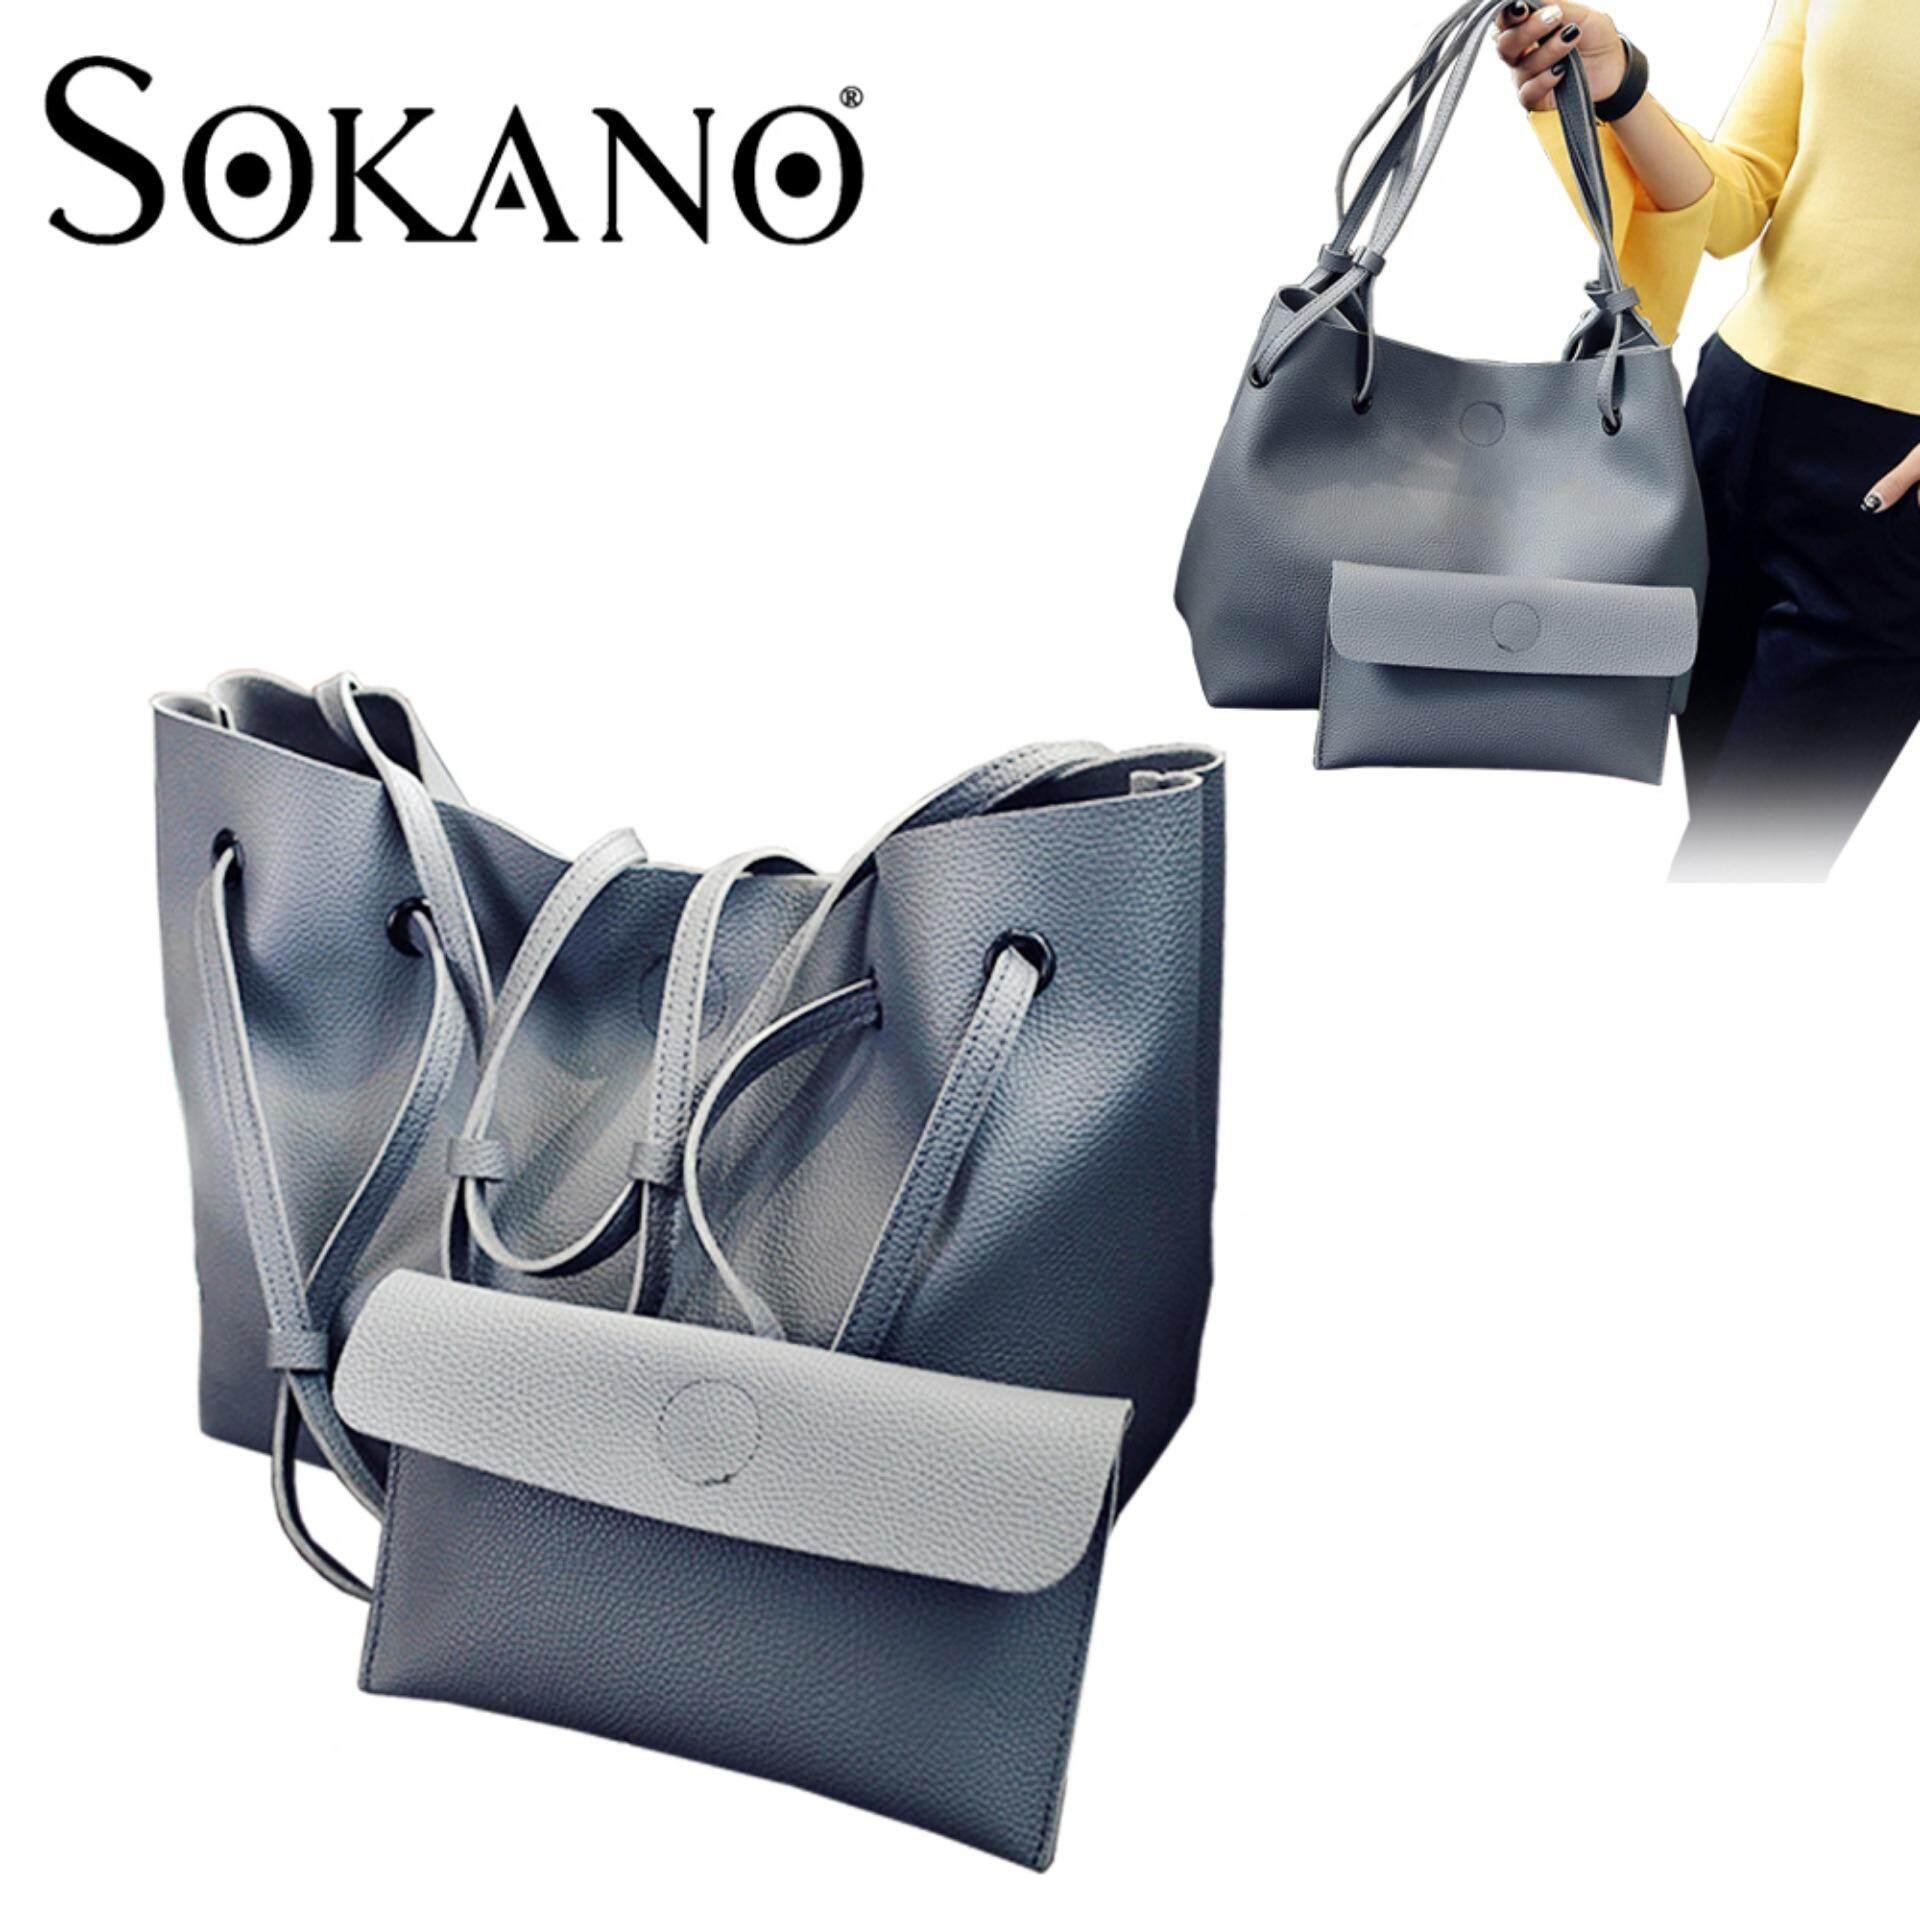 SoKaNo Trendz SKN829 2 in 1 Classic Style Shoulder Tote Bag Handbag Handbeg Wanita- Grey